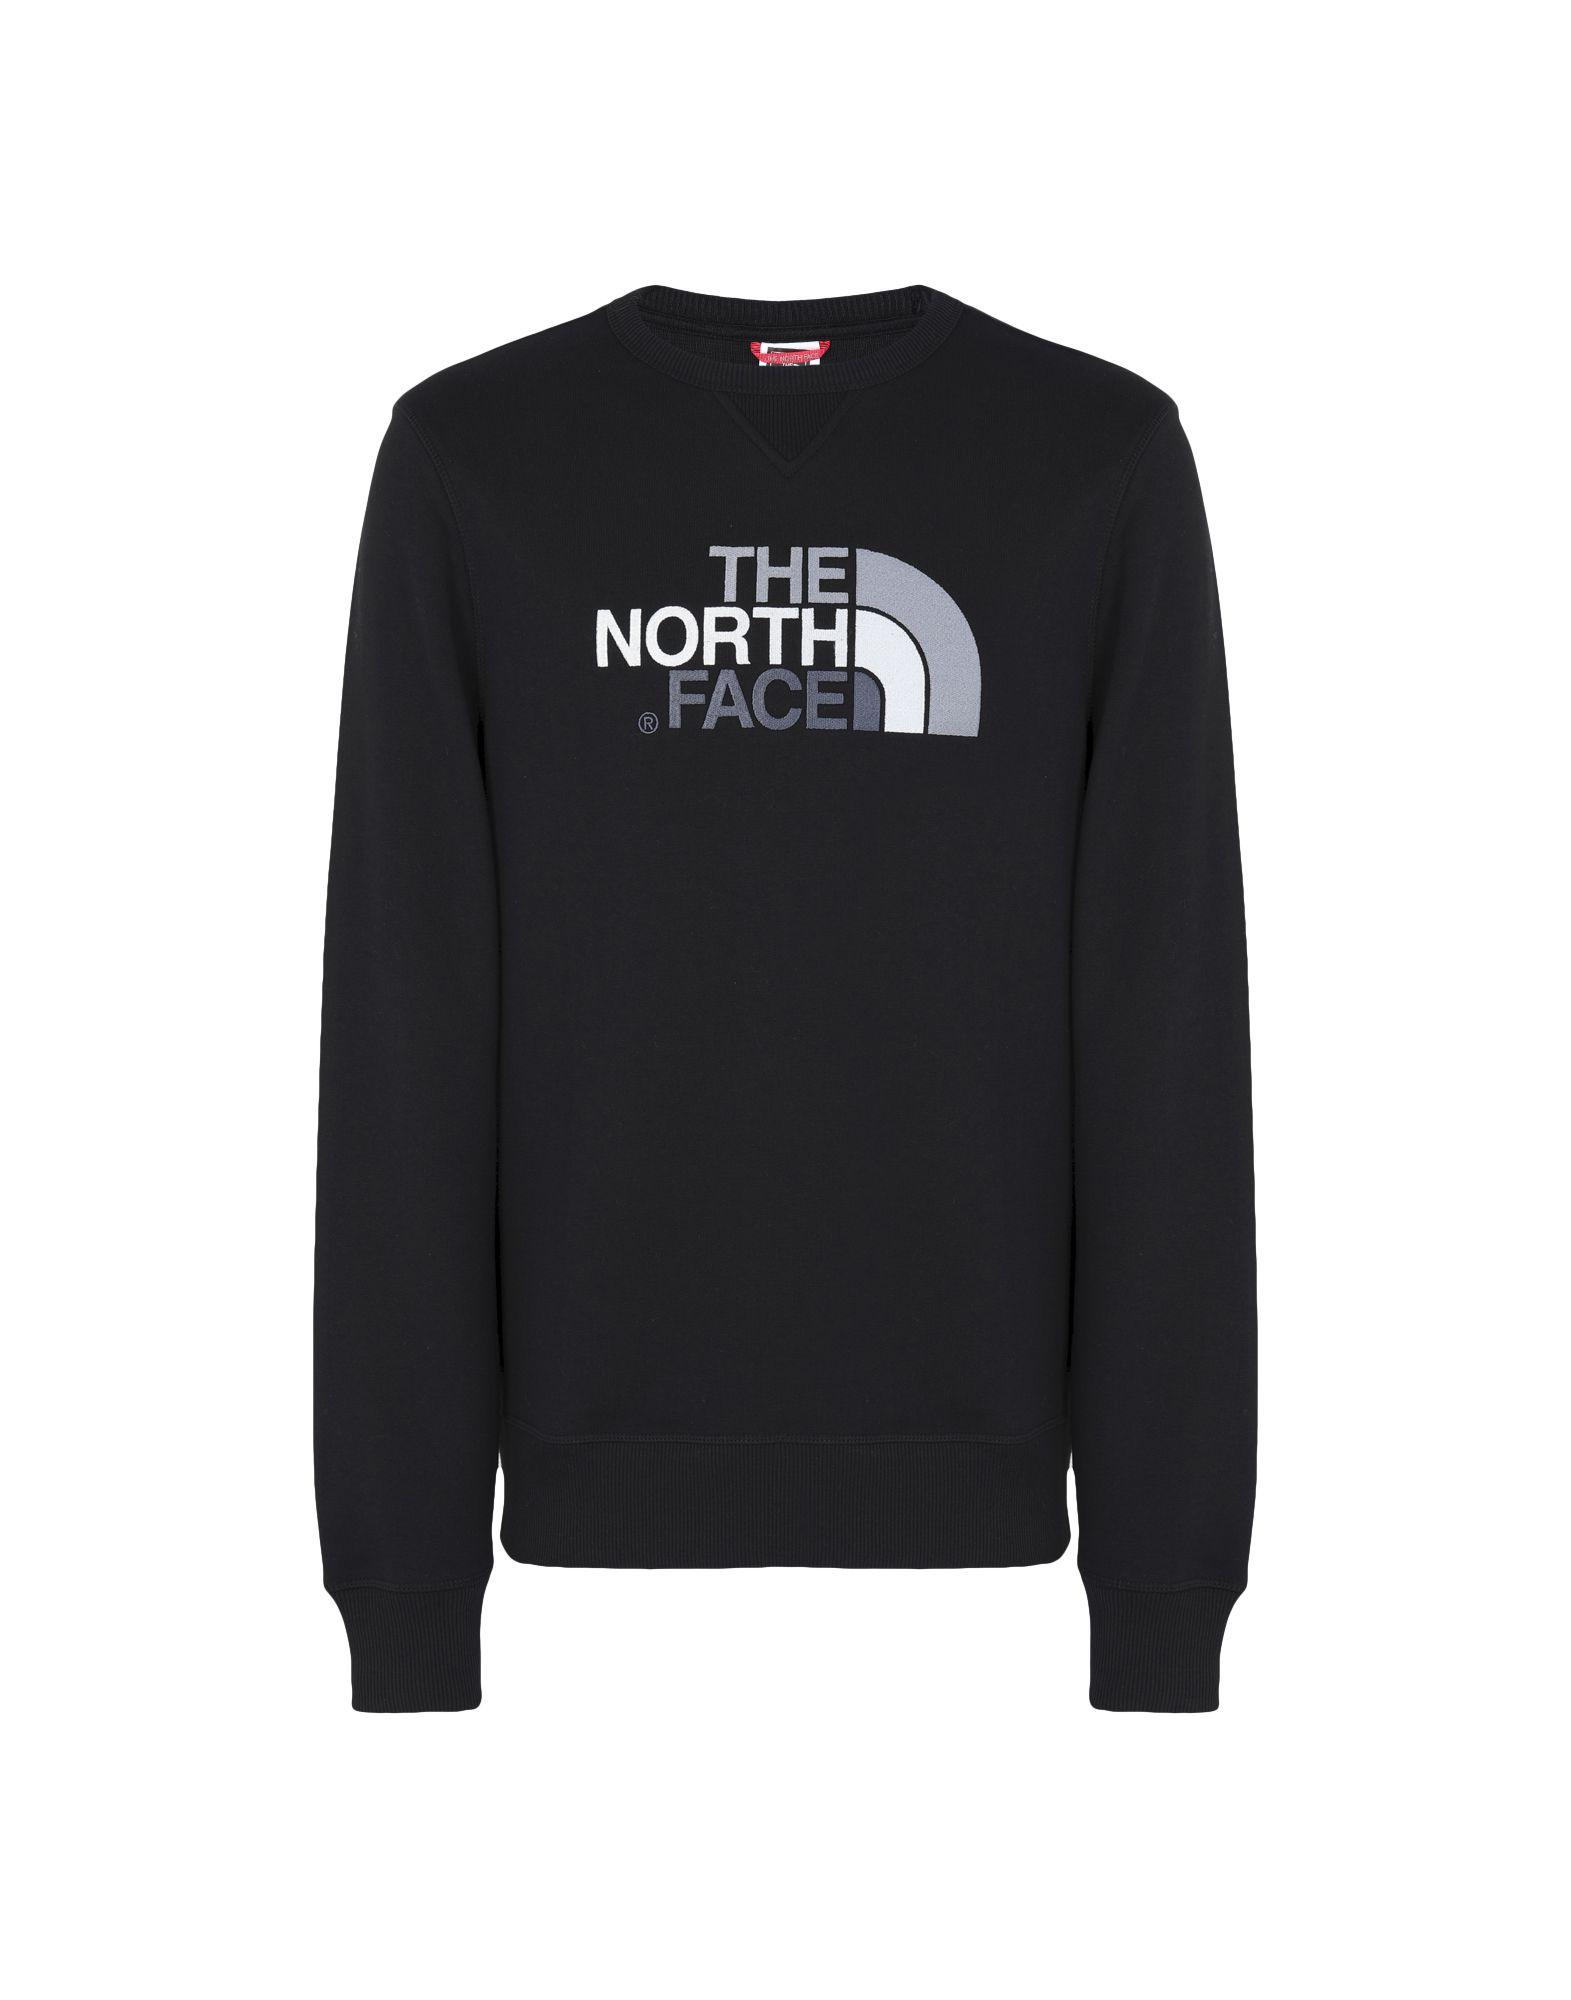 THE NORTH FACE Толстовка толстовка мужская the north face m open ga fzhd цвет зеленый t0cep721l размер l 52